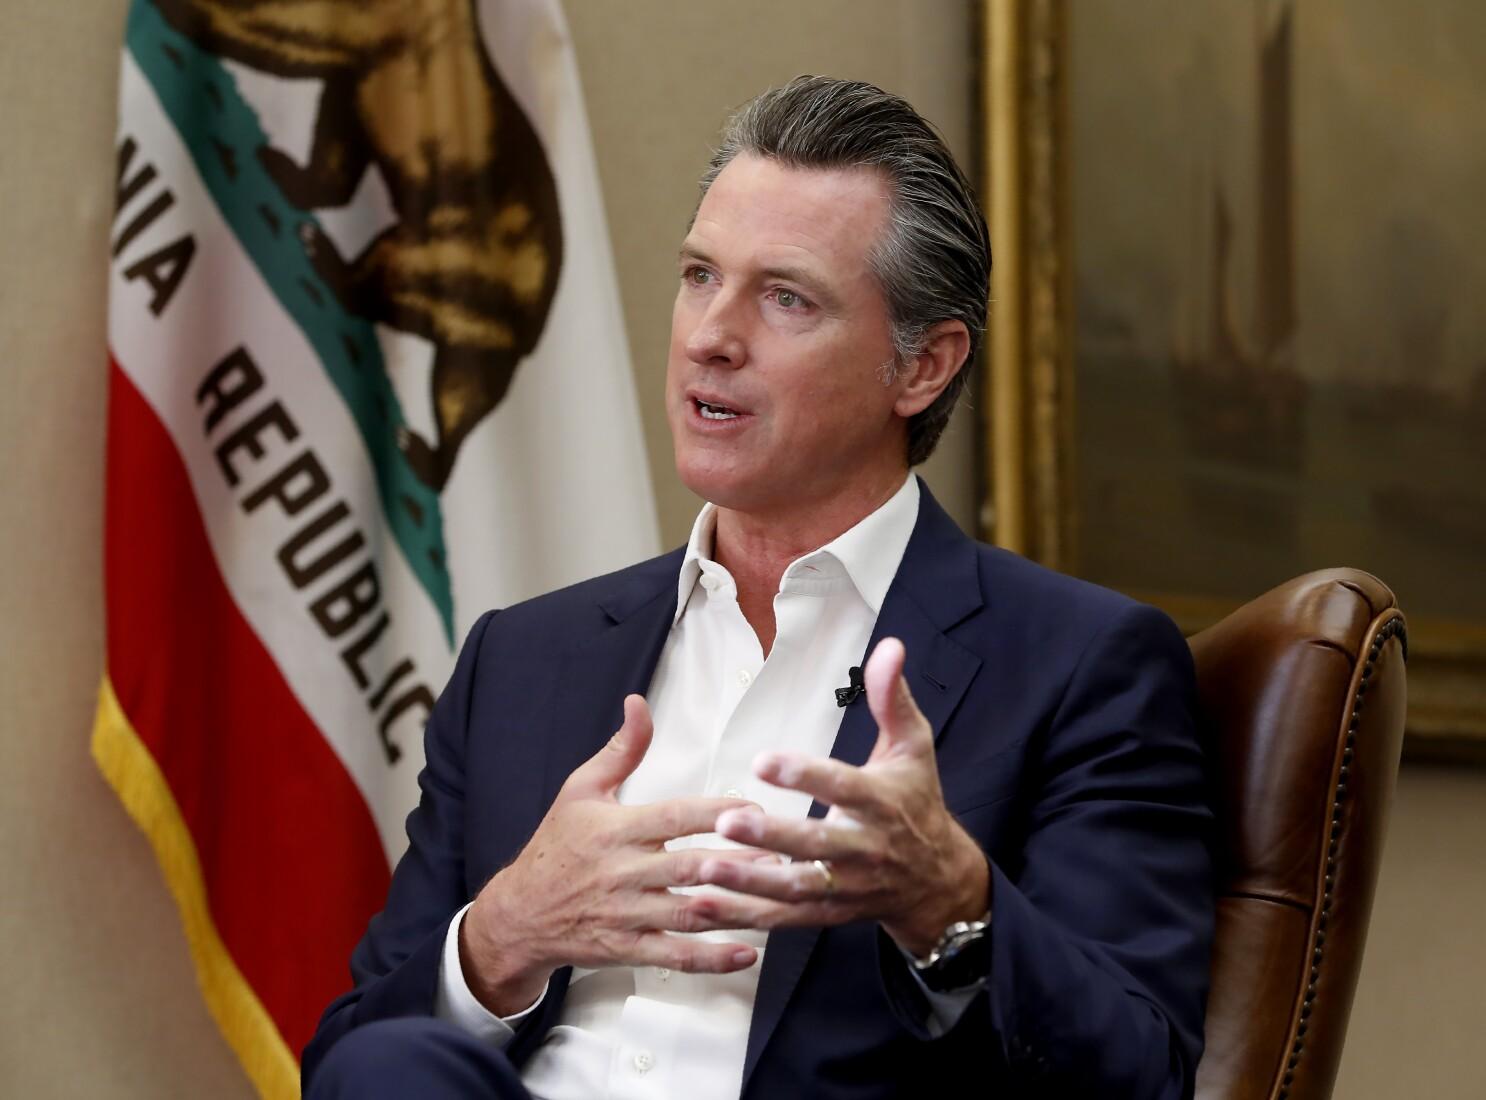 Grading Gavin Newsom: California's most liberal governor ever - Los Angeles  Times